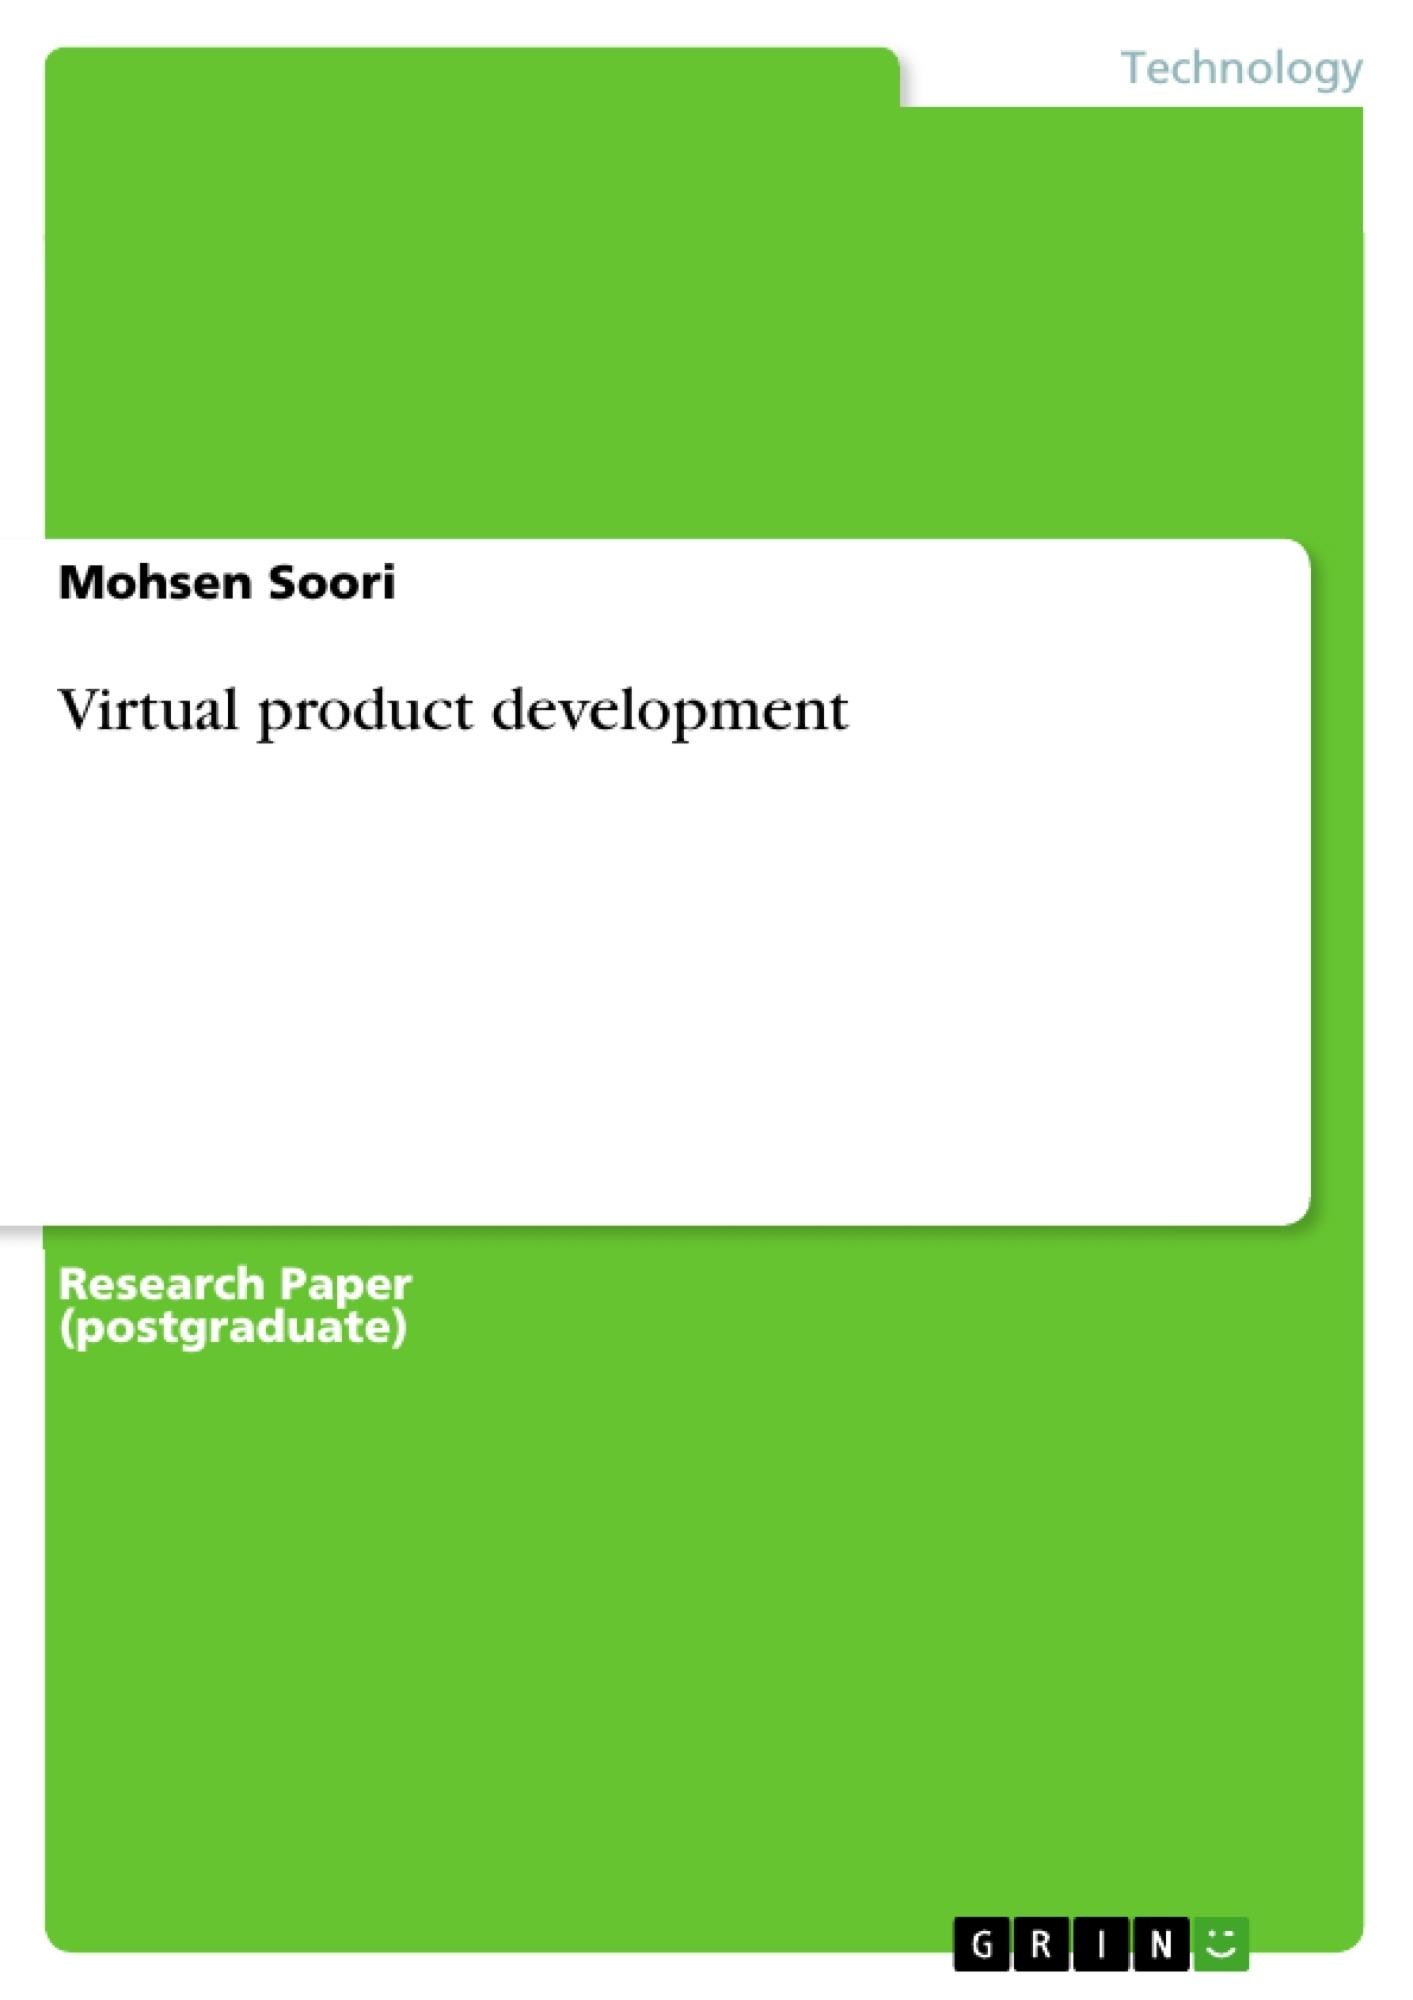 Title: Virtual product development